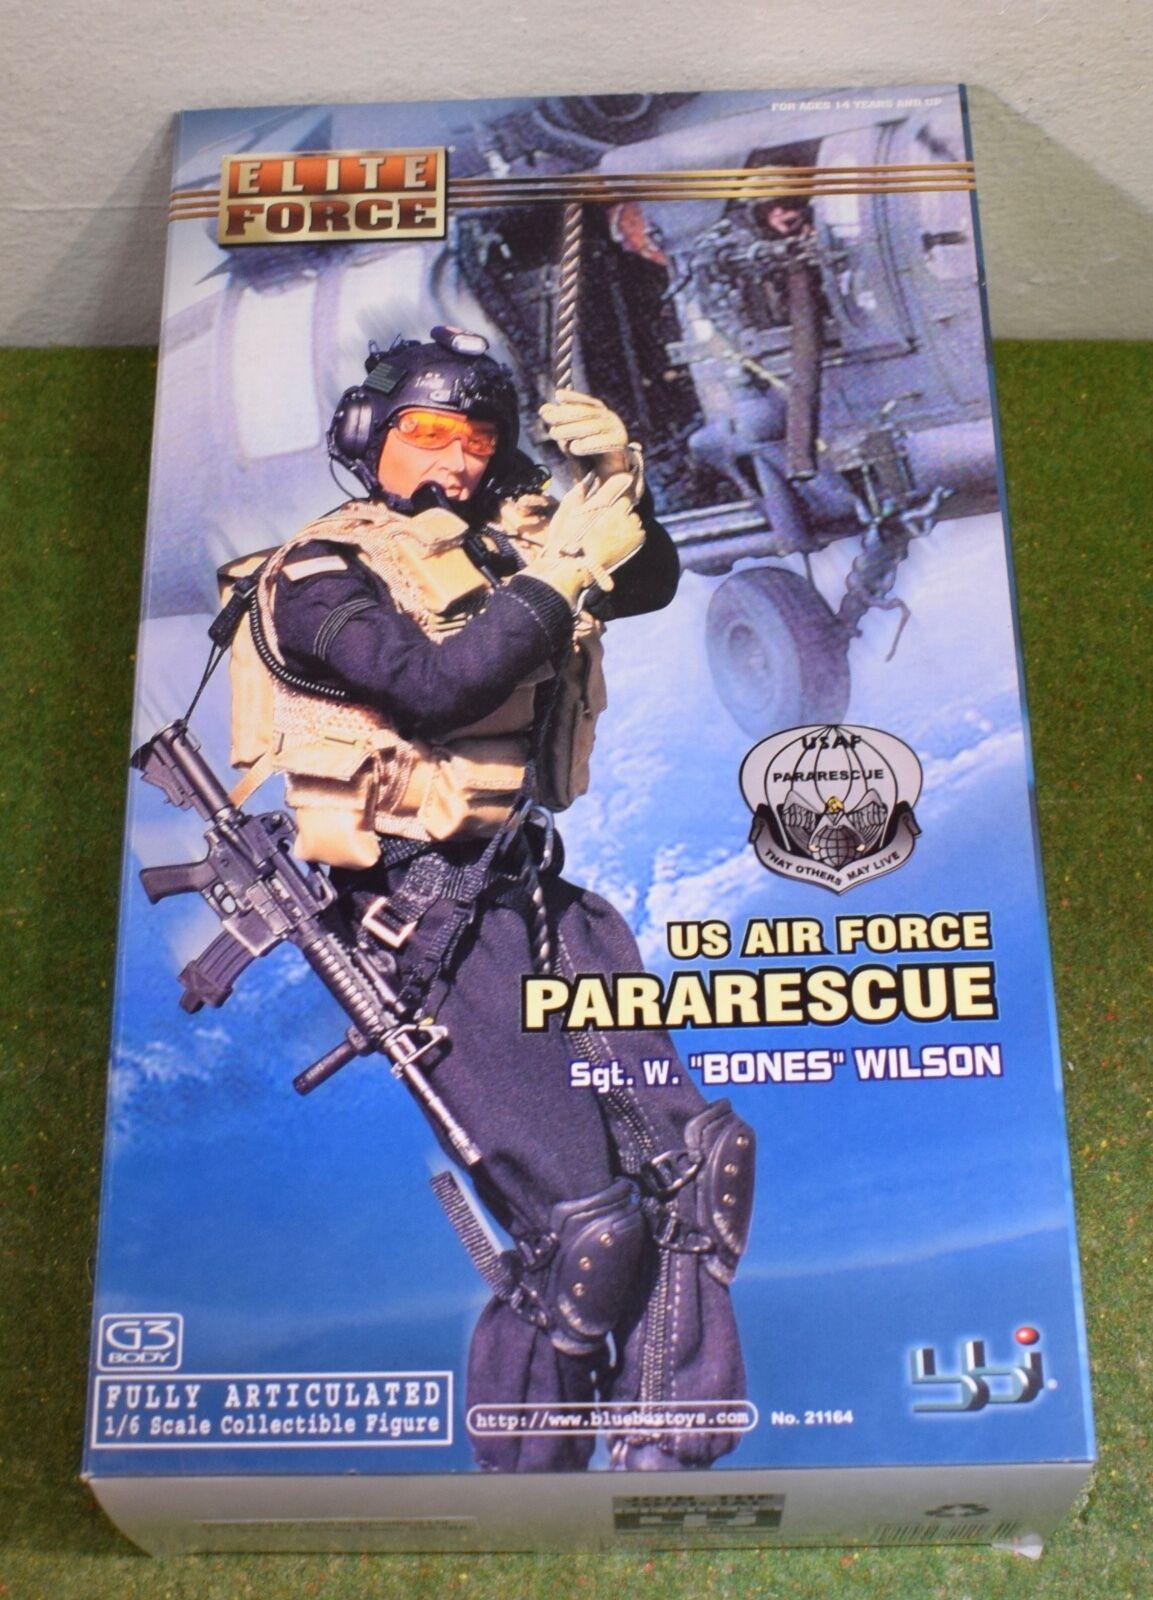 ELITE FORCE - BBI 1 6 MODERN US Sgt W. BONES WILSON US AIR FORCE PARARESCUE